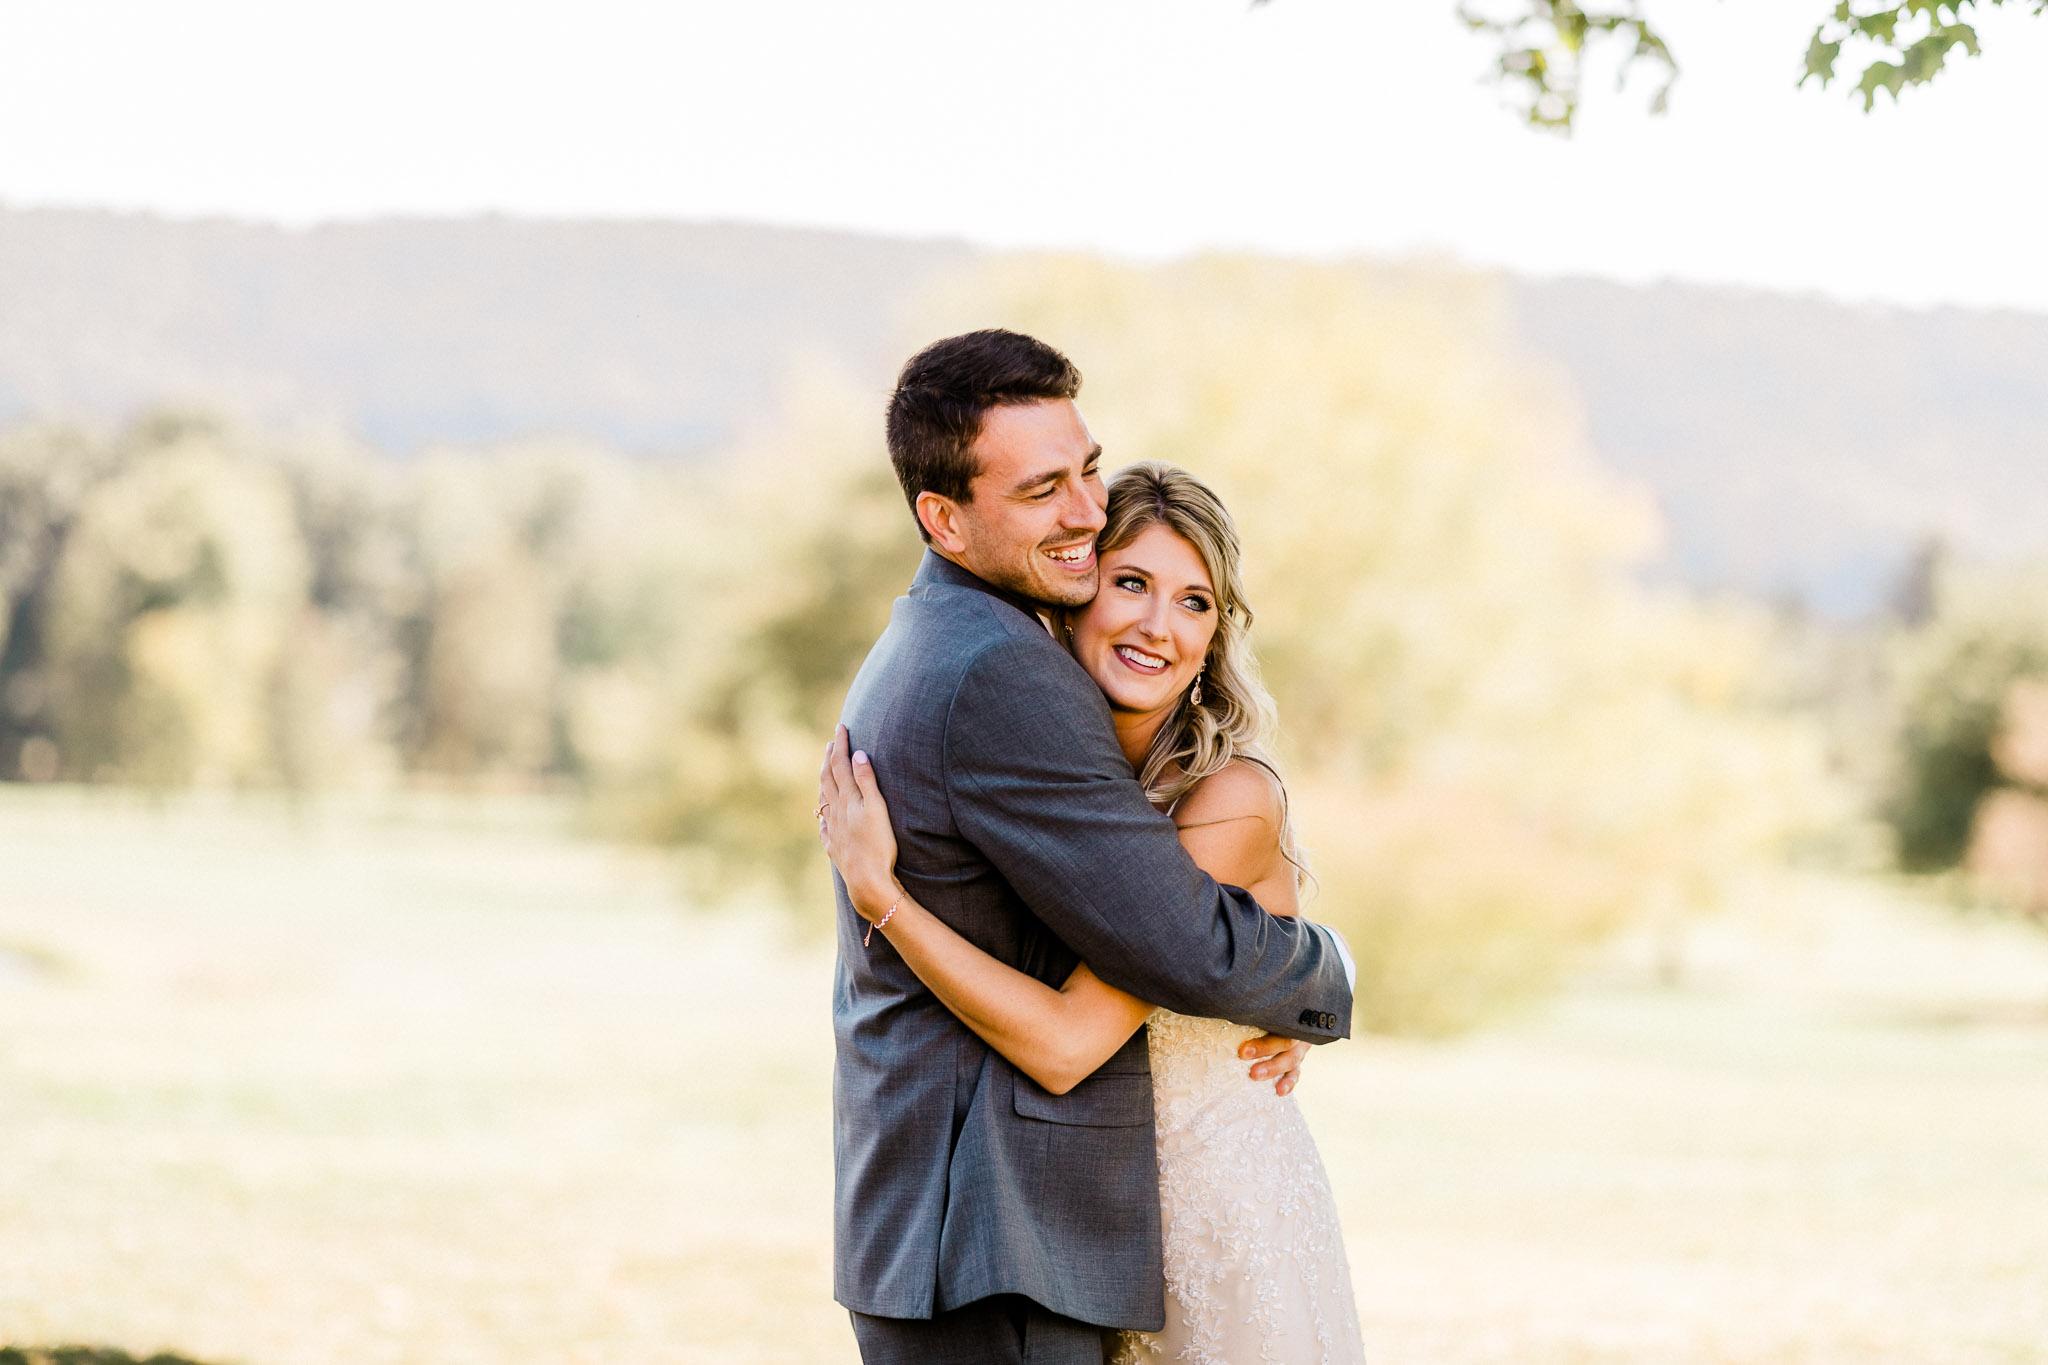 Frosty-Valley-September-Wedding-7193.jpg